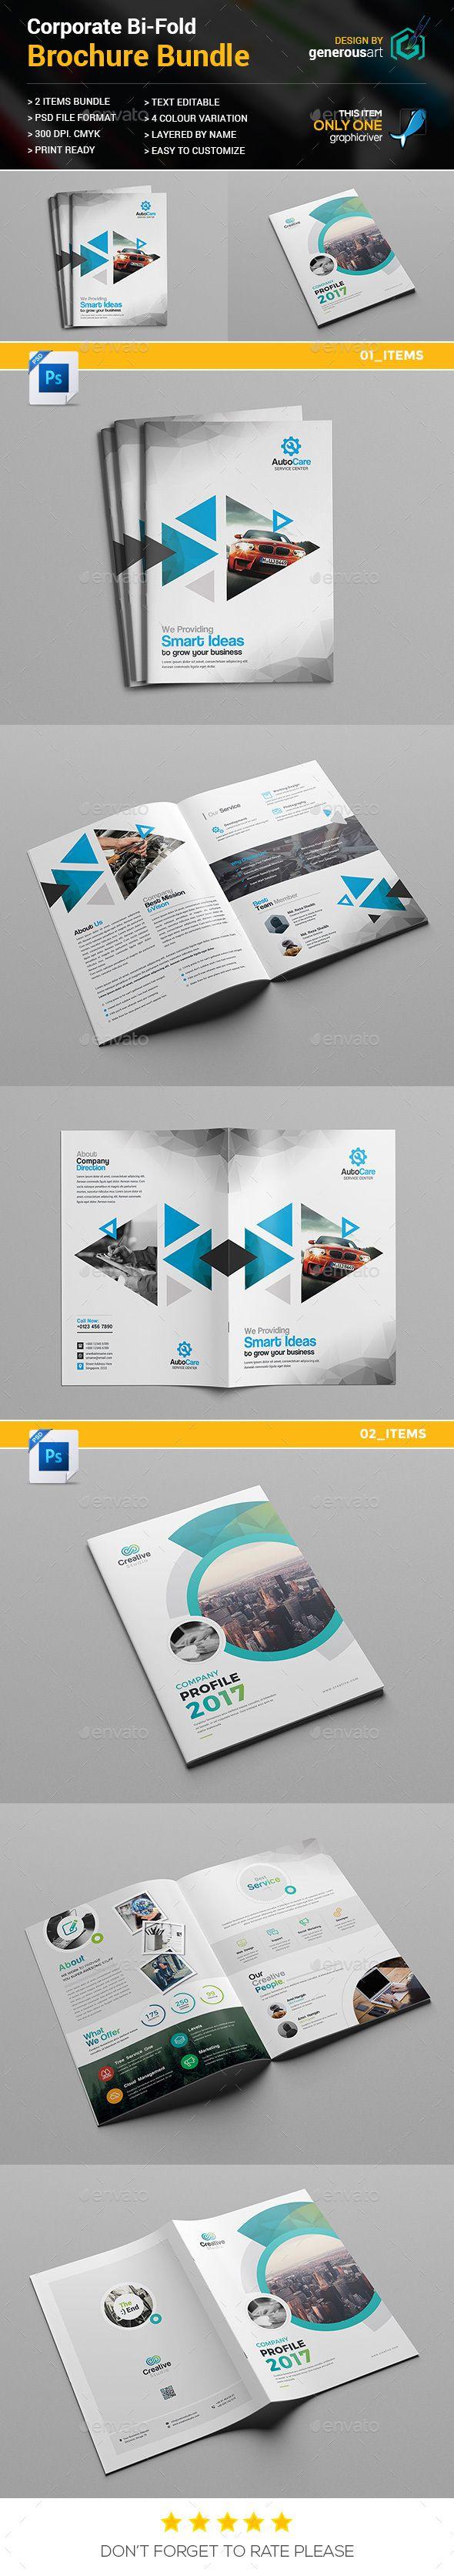 BiFold Brochure Bundle 2 in 1 — Photoshop PSD #green bi-fold #simple bi-fold • Available here → https://graphicriver.net/item/bifold-brochure-bundle-2-in-1/20520303?ref=pxcr